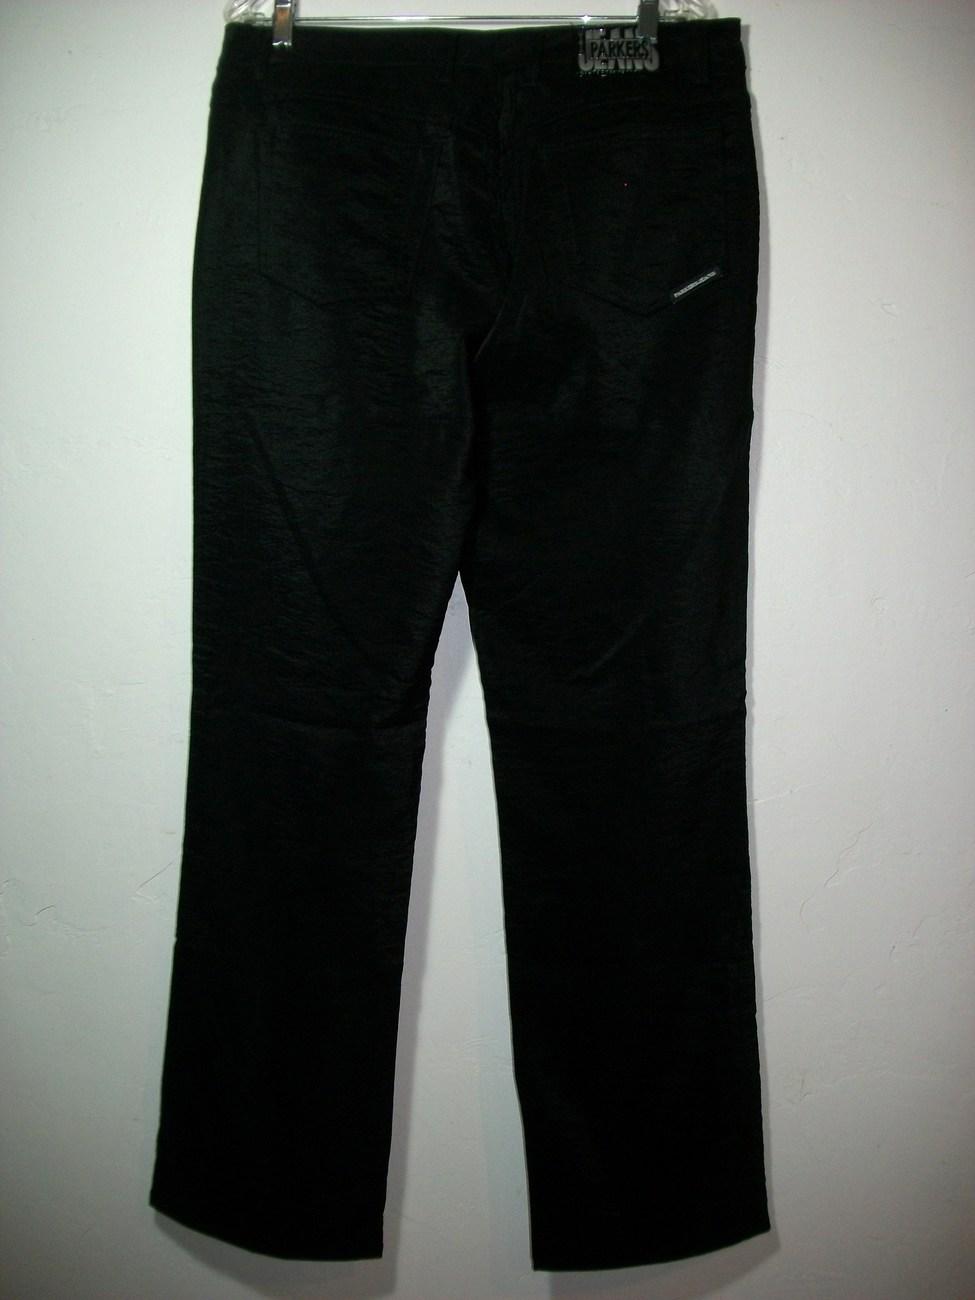 WOMEN PARKERS SIZE 21/22  BLACK DRESS JEANS PLUS  LIKE 1X NEW